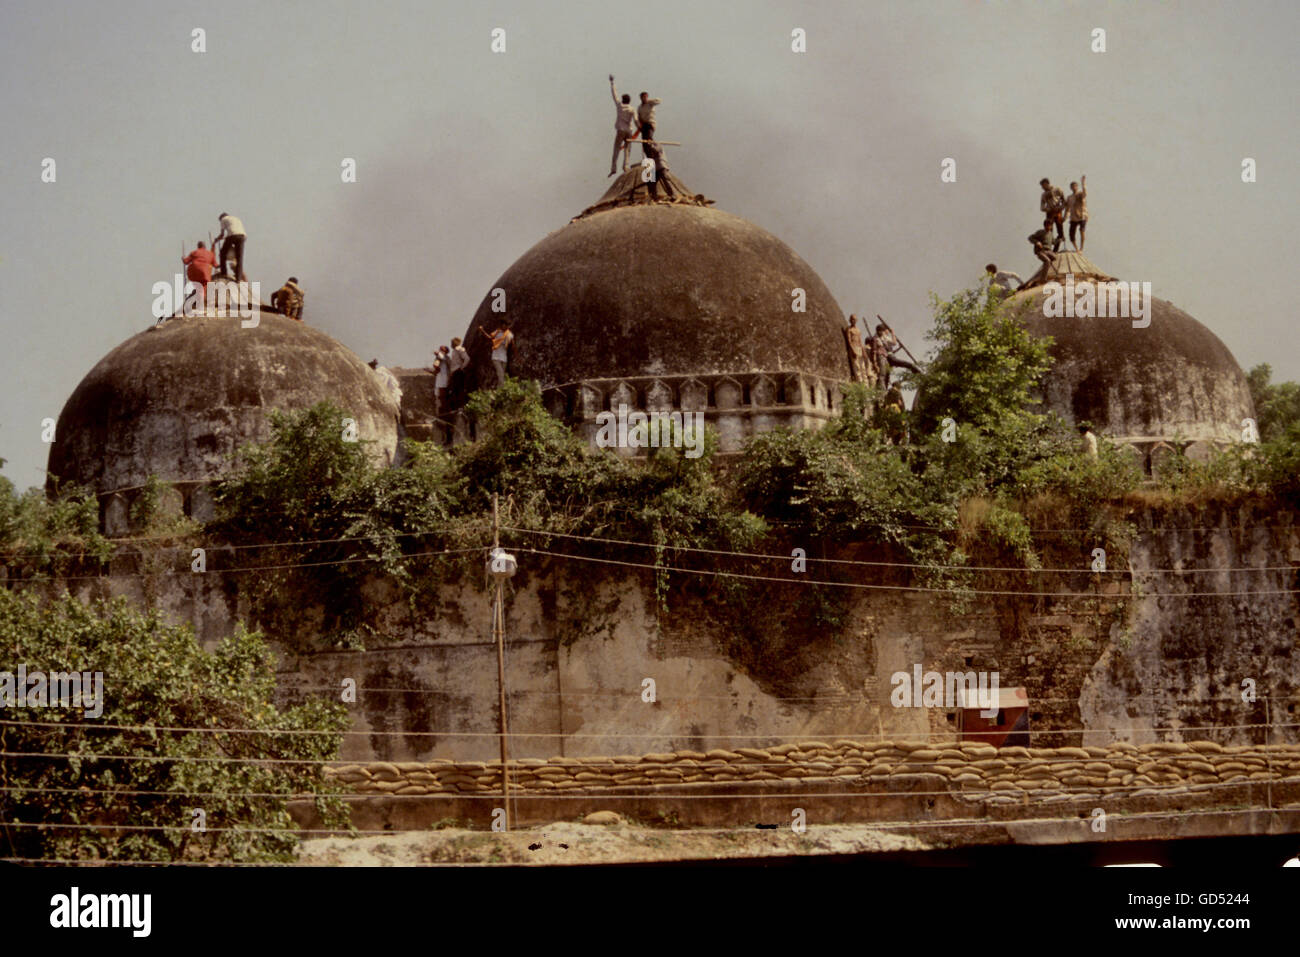 Babri Masjid High Resolution Stock Photography And Images Alamy